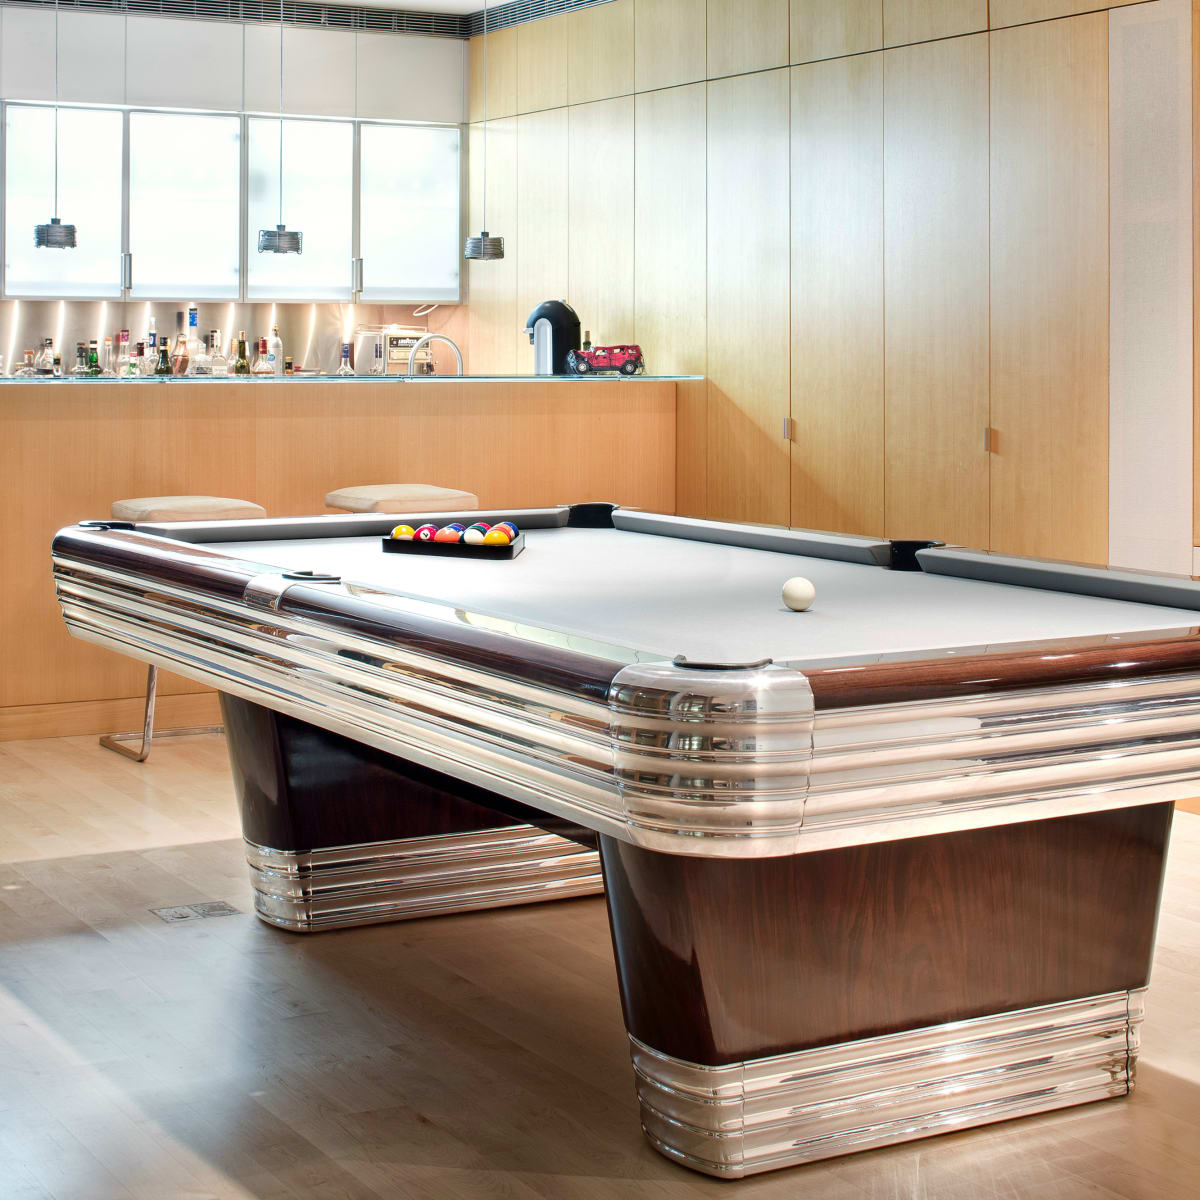 Austin home Floating Box House 900 Live Oak Circle West Lake Hills 78746 April 2016 bar pool table billiards room